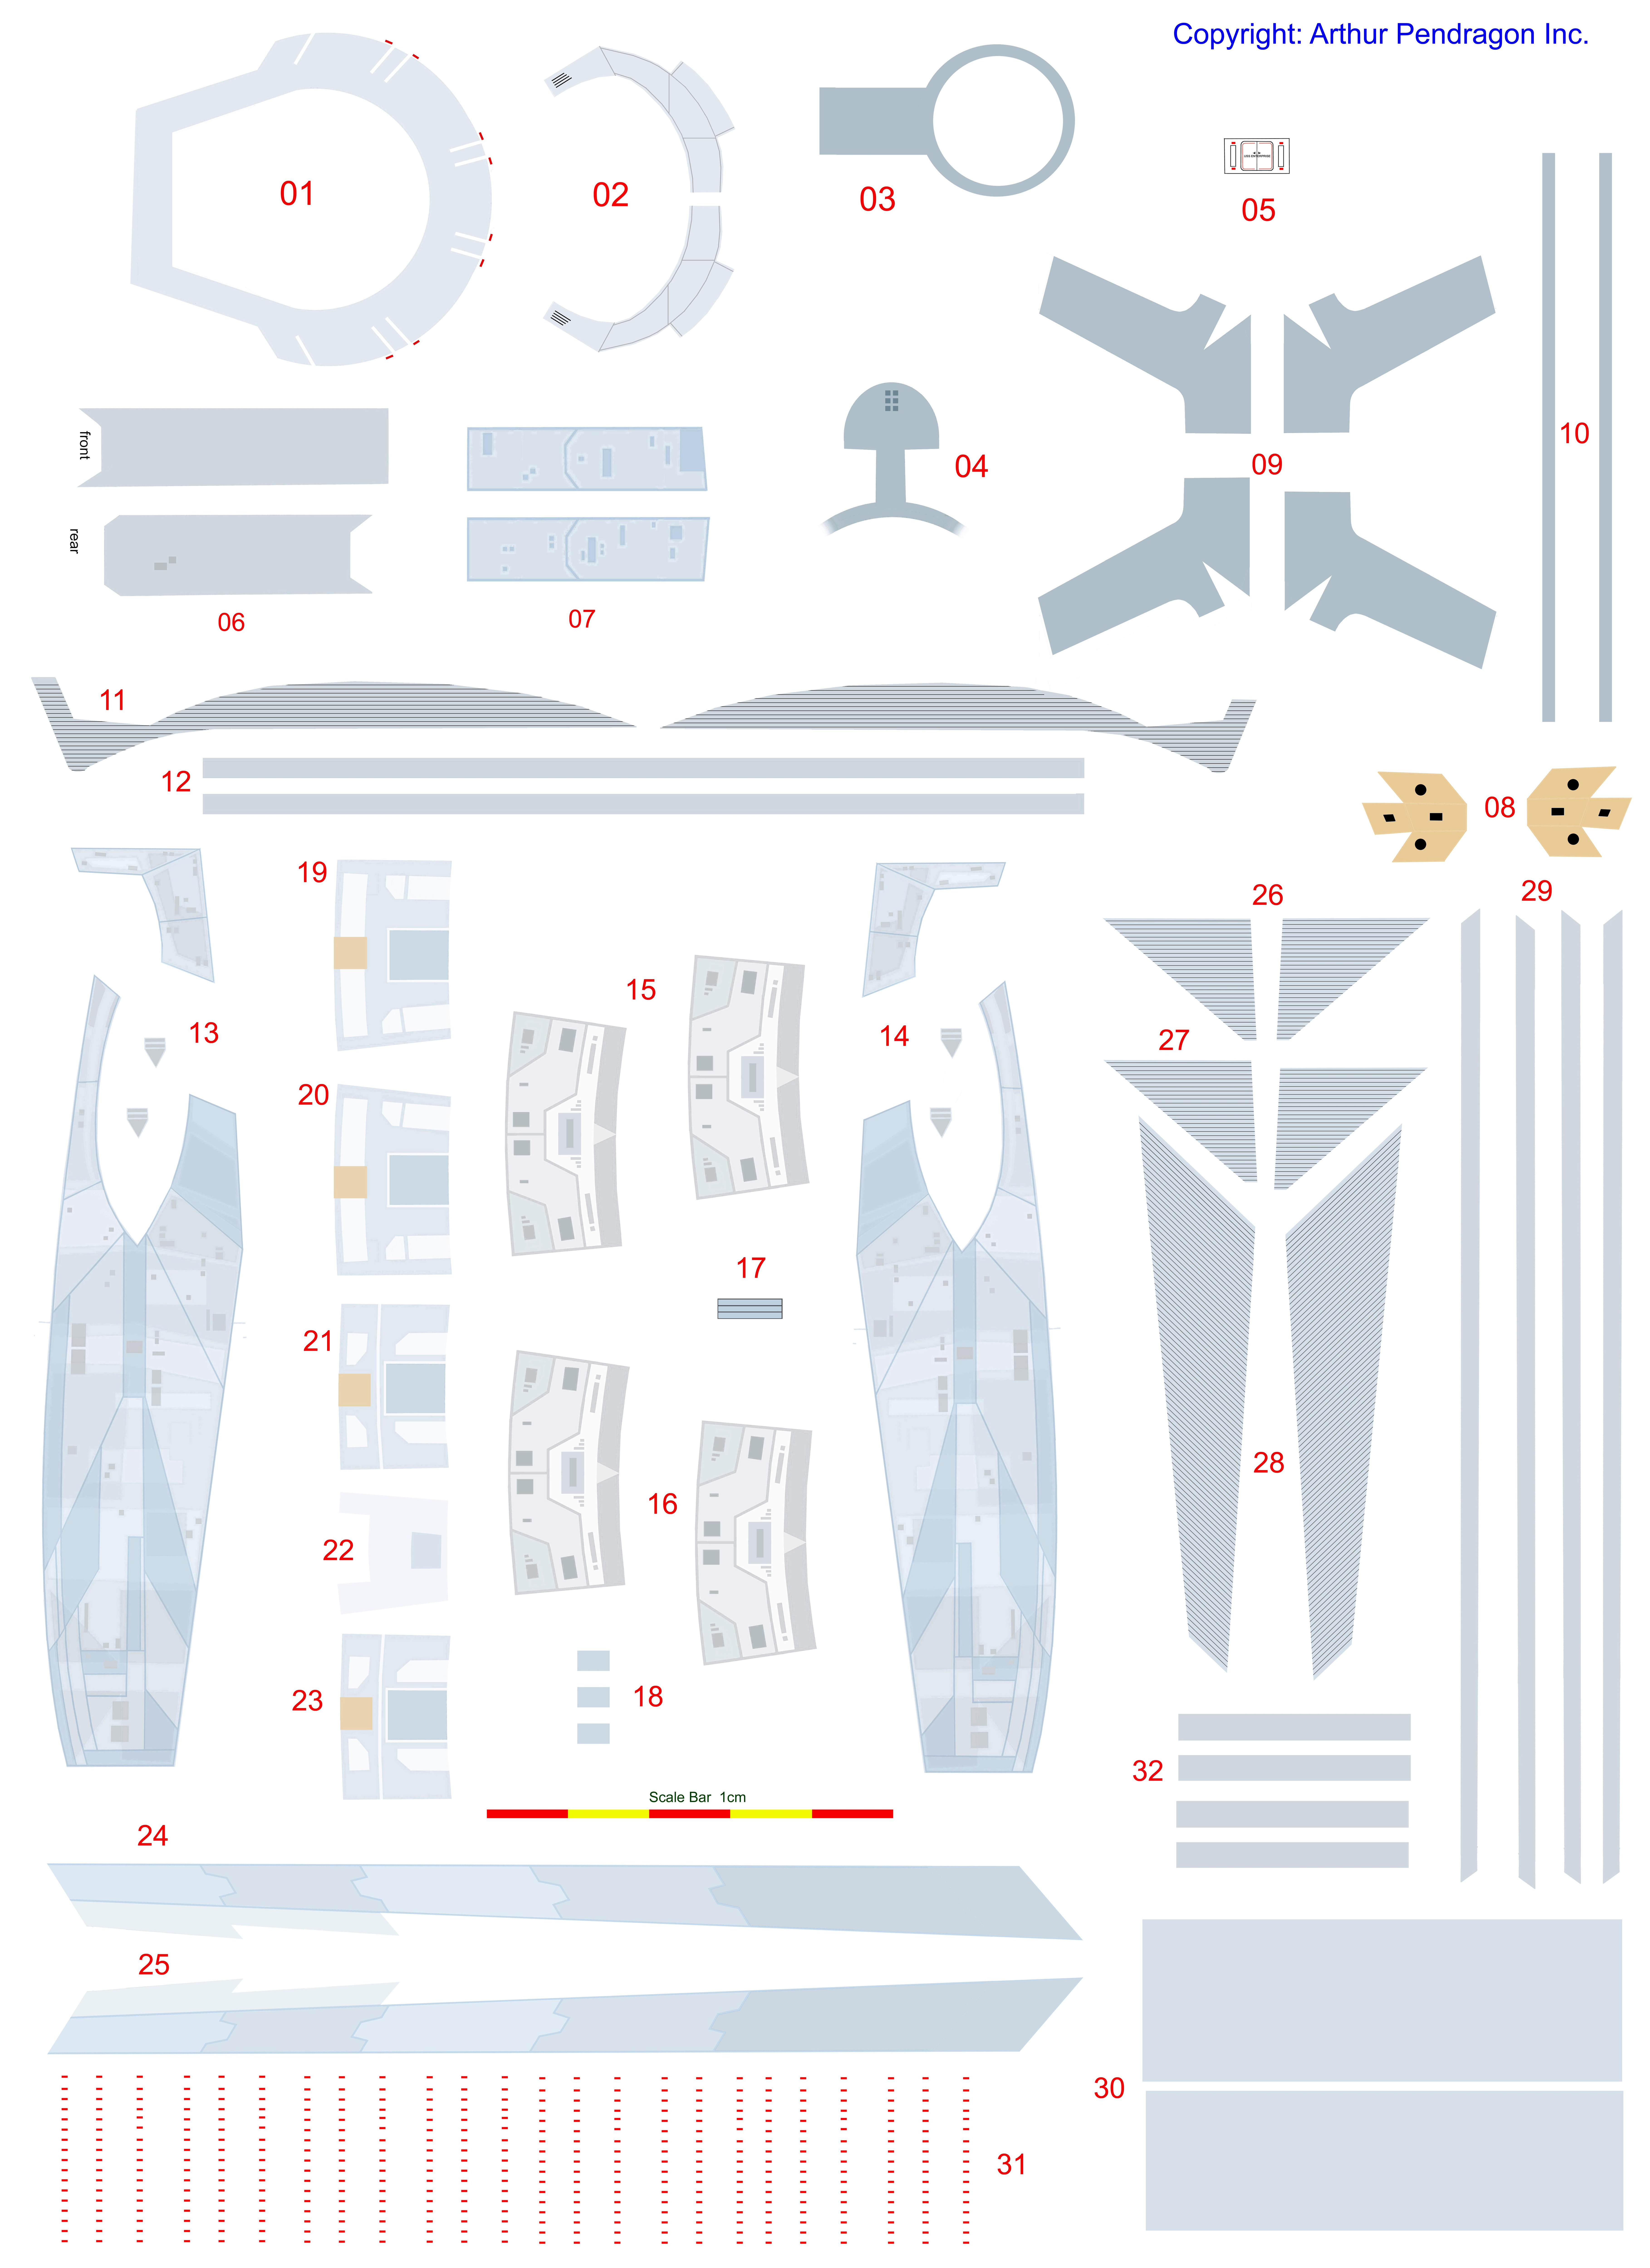 Star trek uss enterprise ncc refit 1 scale model - Decals 8 5 Mb Jpg